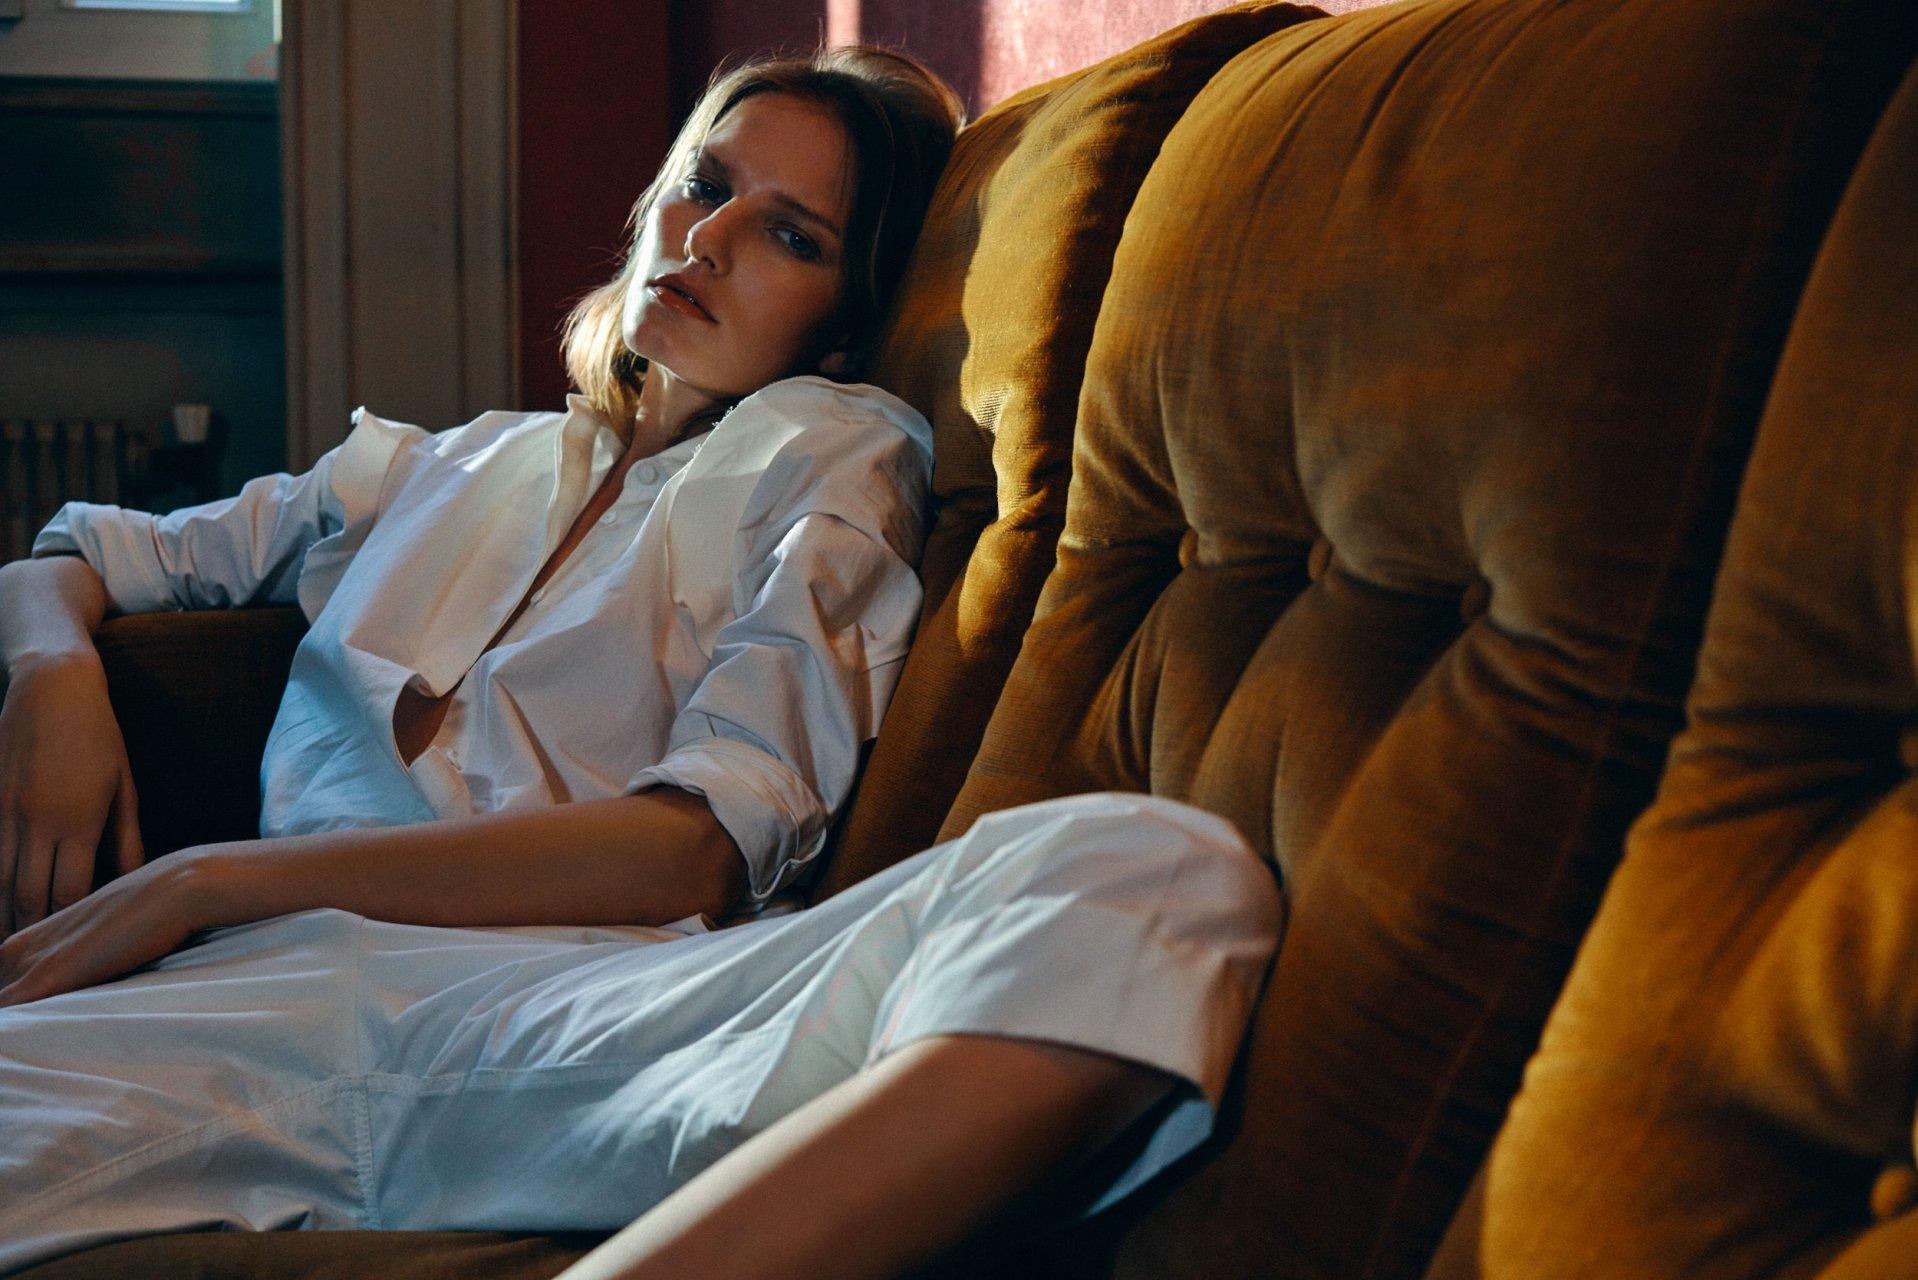 Hayden Panettiere Slanders Cancer's Good Name recommendations